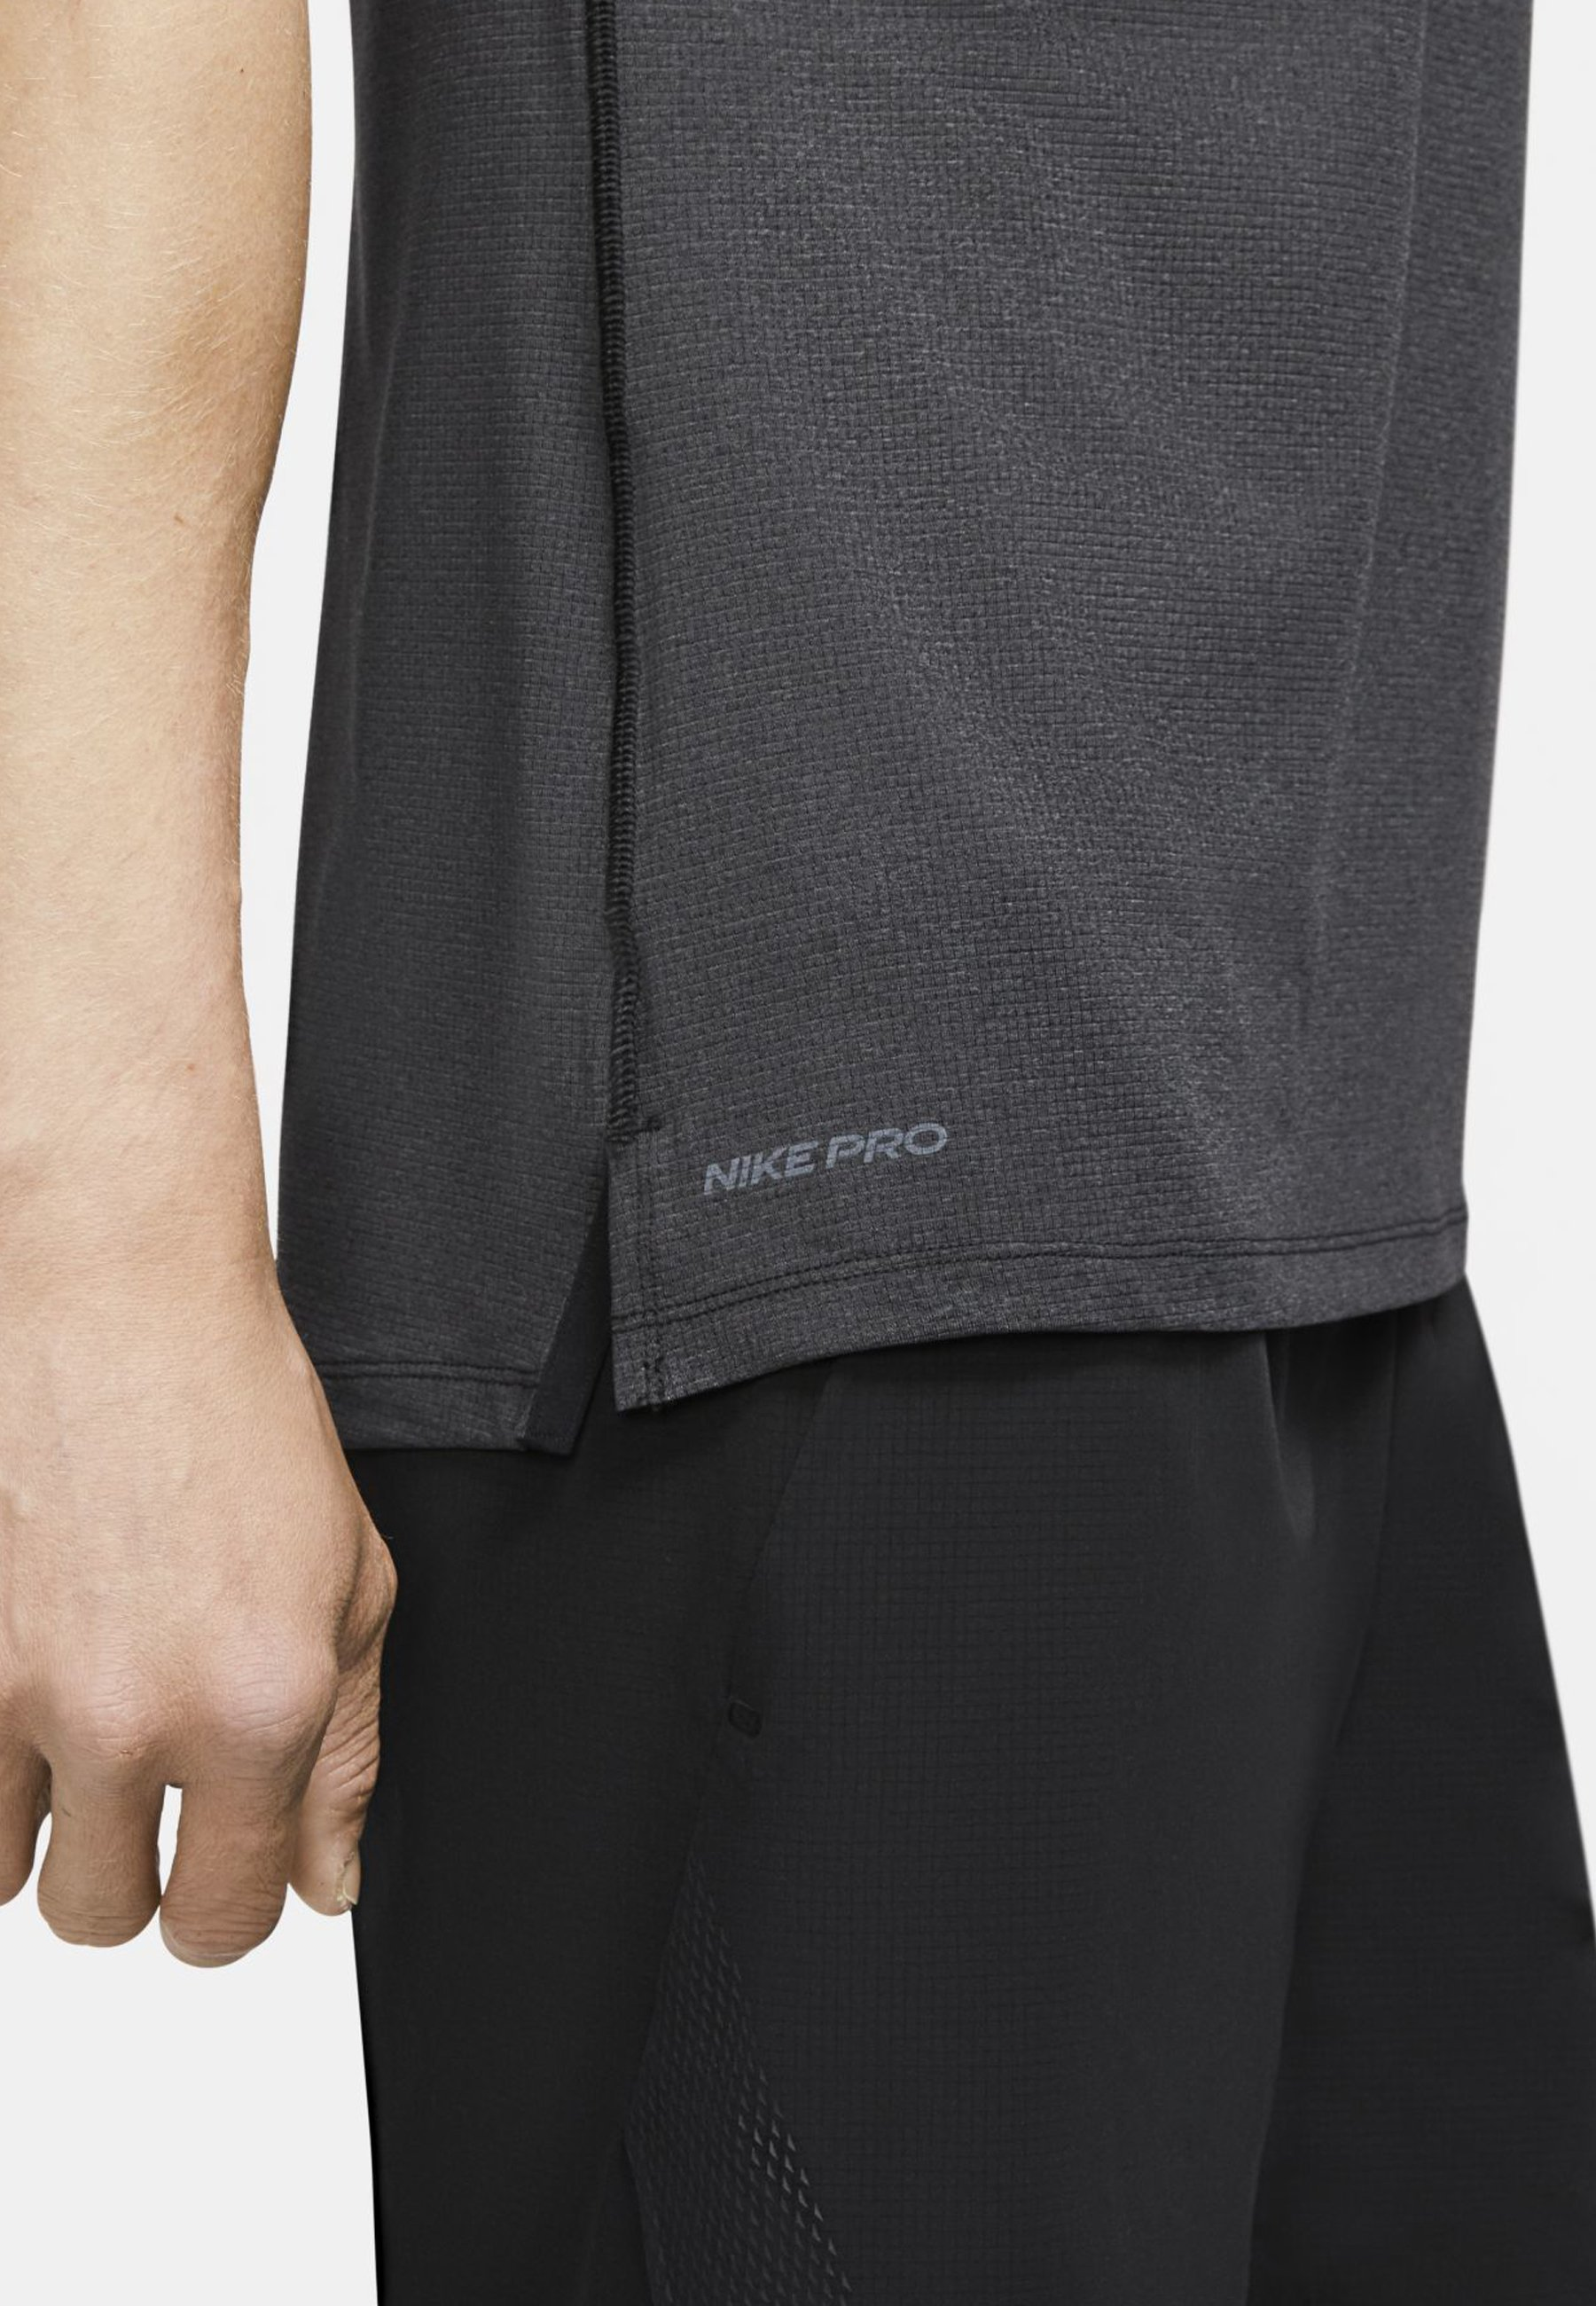 Nike Performance Pro Breathe Herren-tank - Top Black/black/white mCN873G